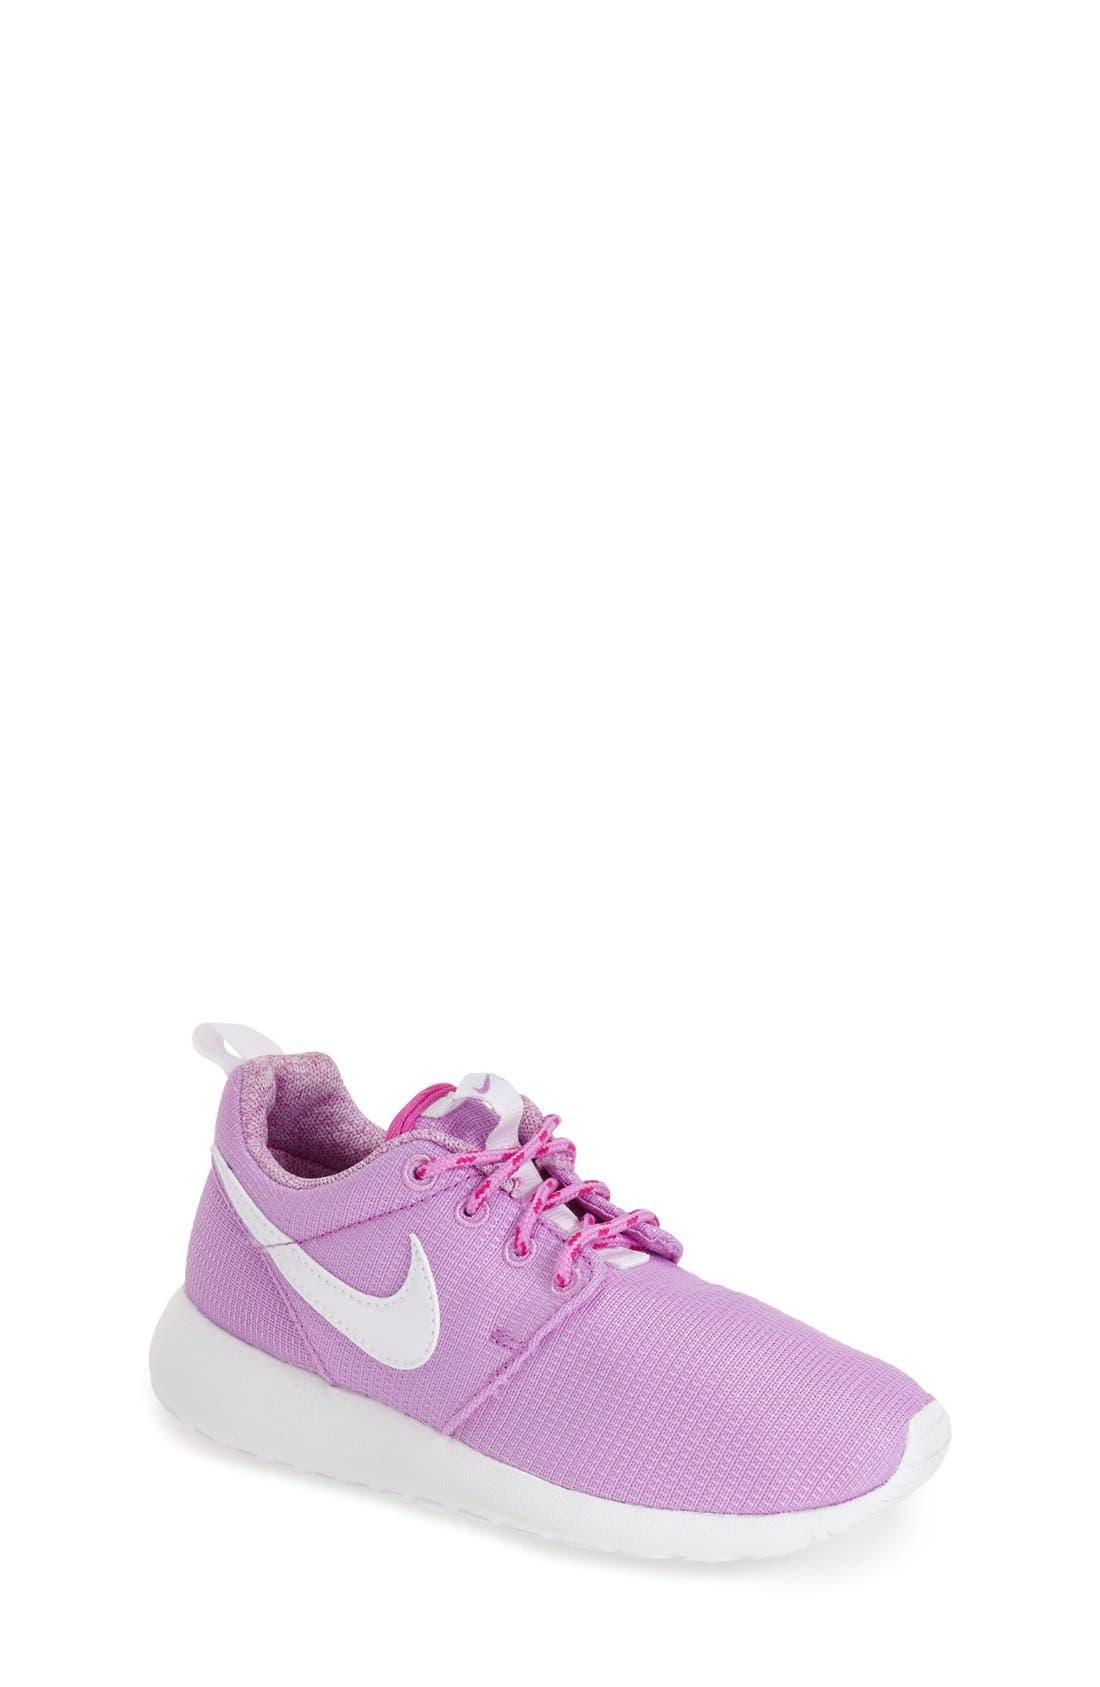 'Roshe Run' Athletic Shoe,                             Main thumbnail 42, color,